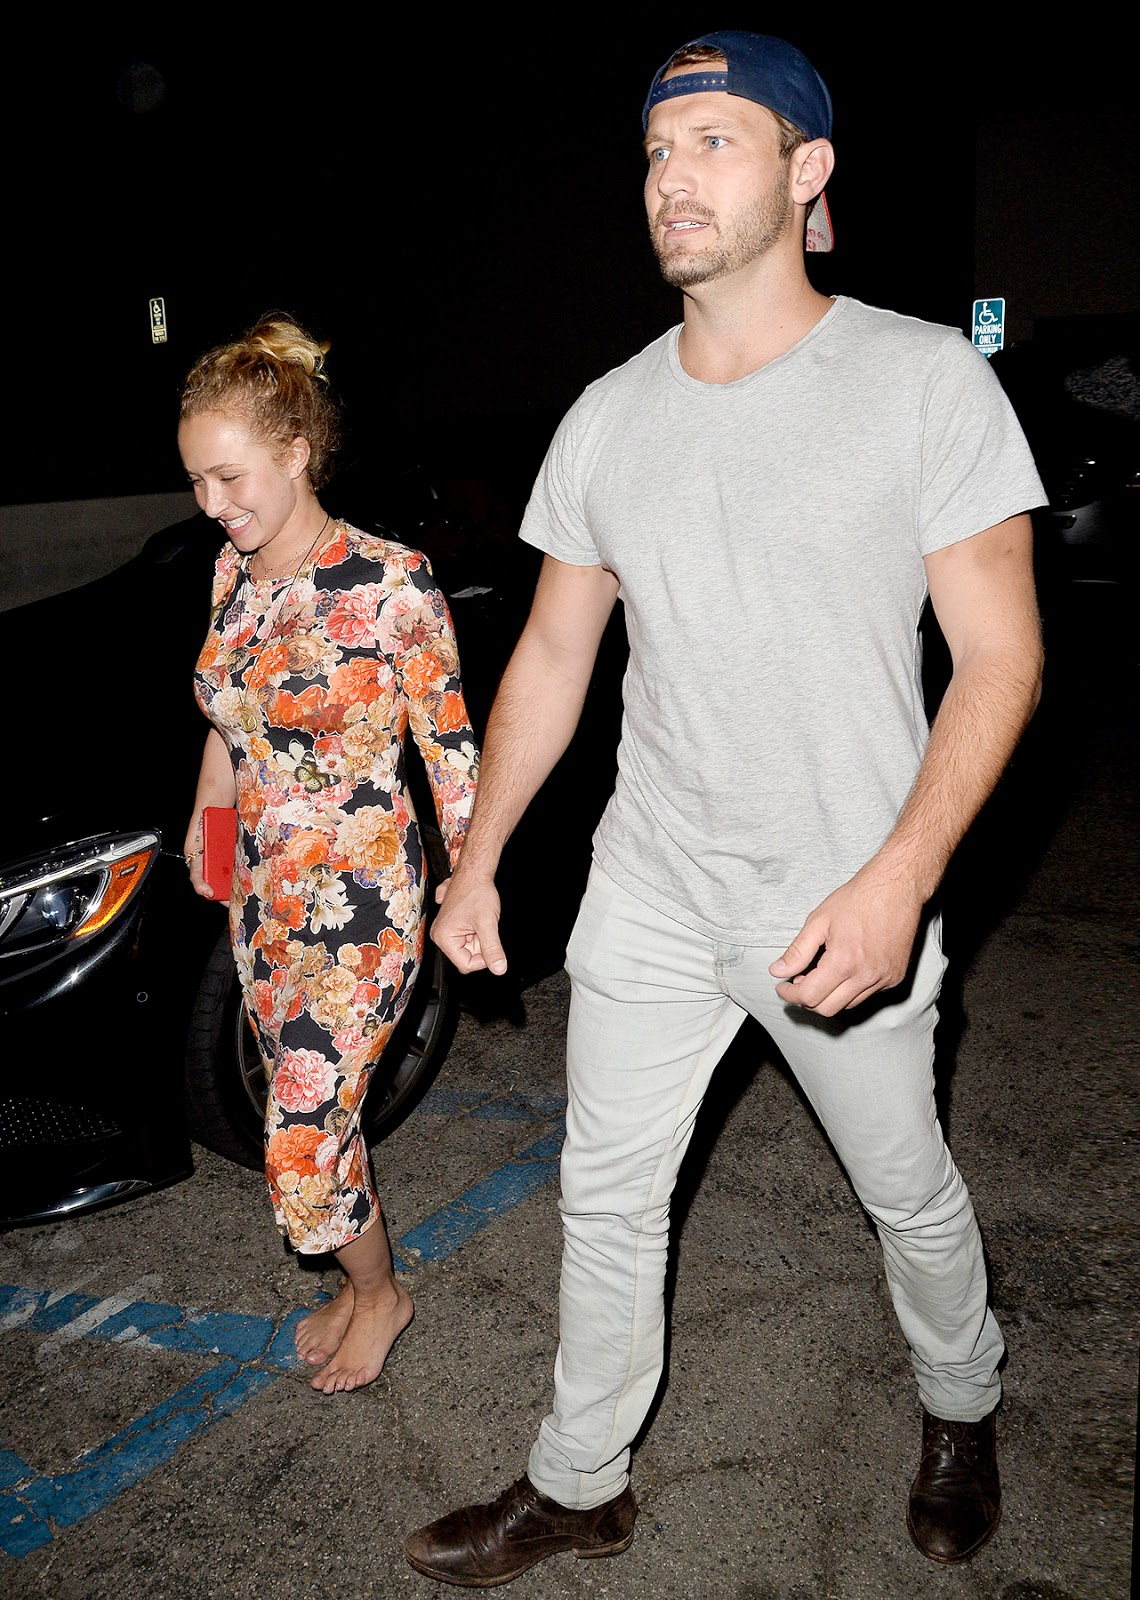 Hayden Panettieres Boyfriend Arrested for Domestic